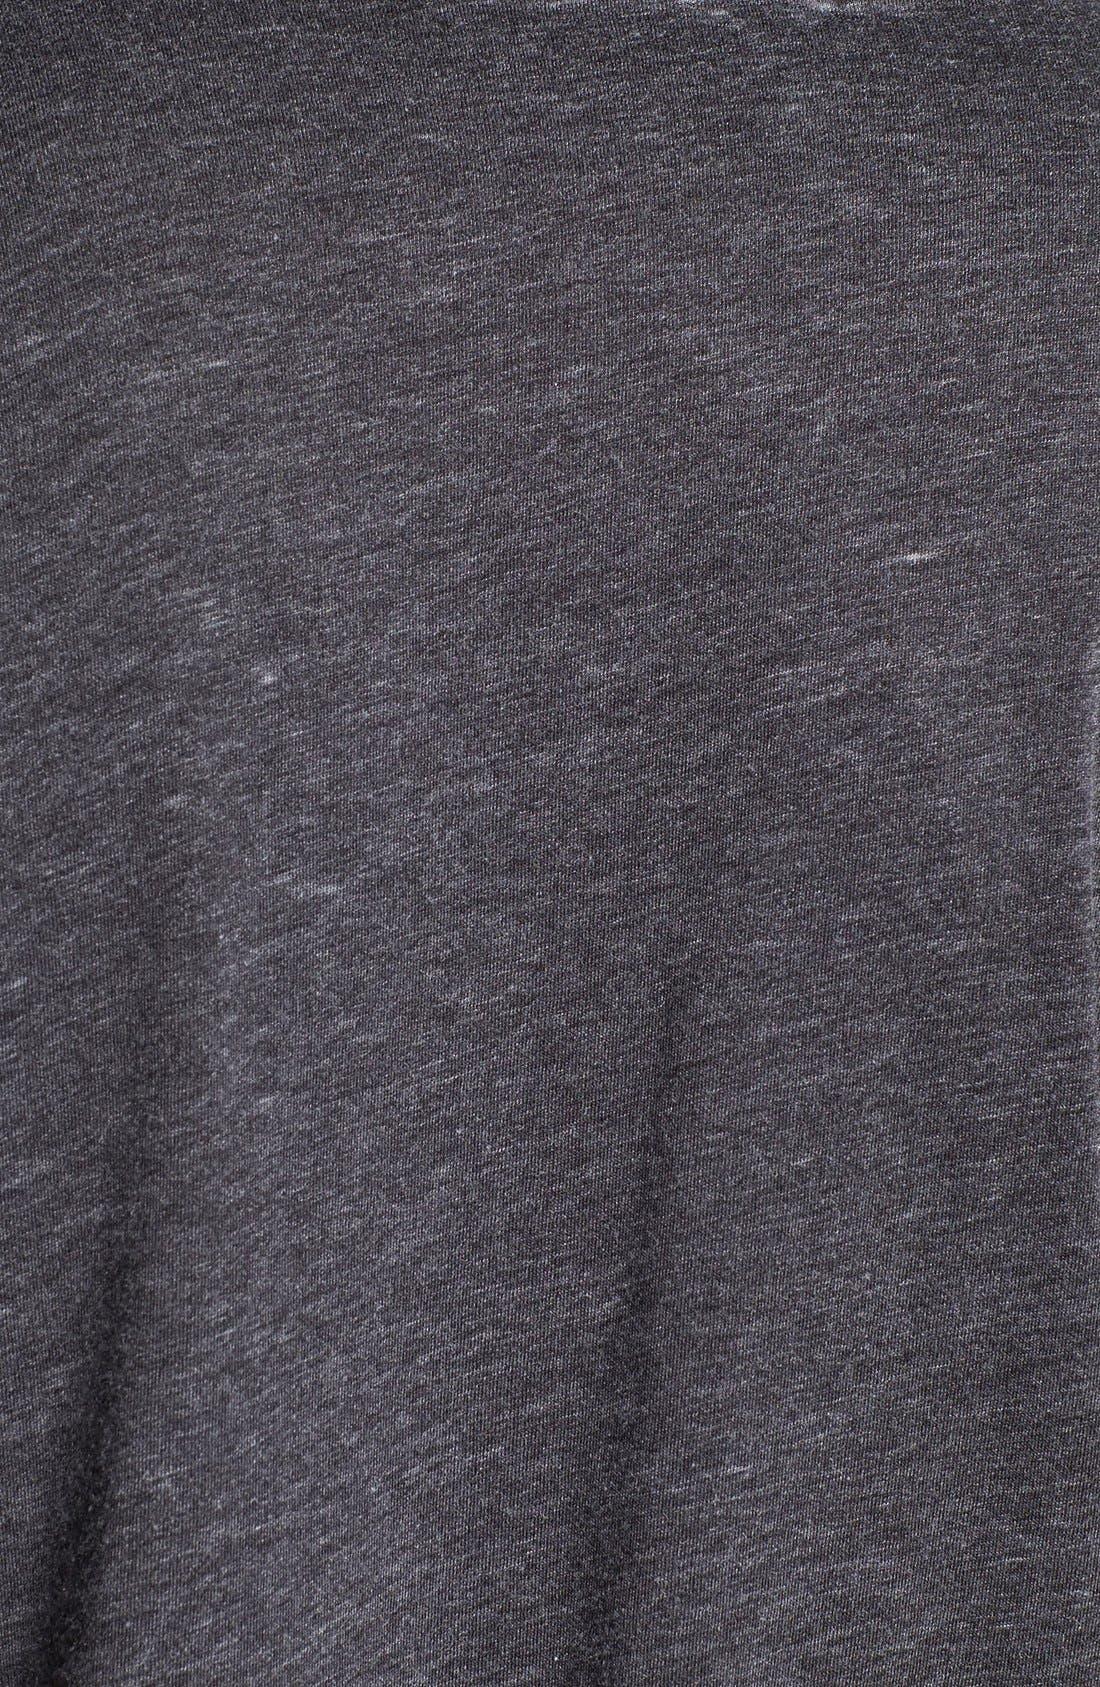 Alternate Image 3  - Hurley 'Guitar Stack' Graphic T-Shirt